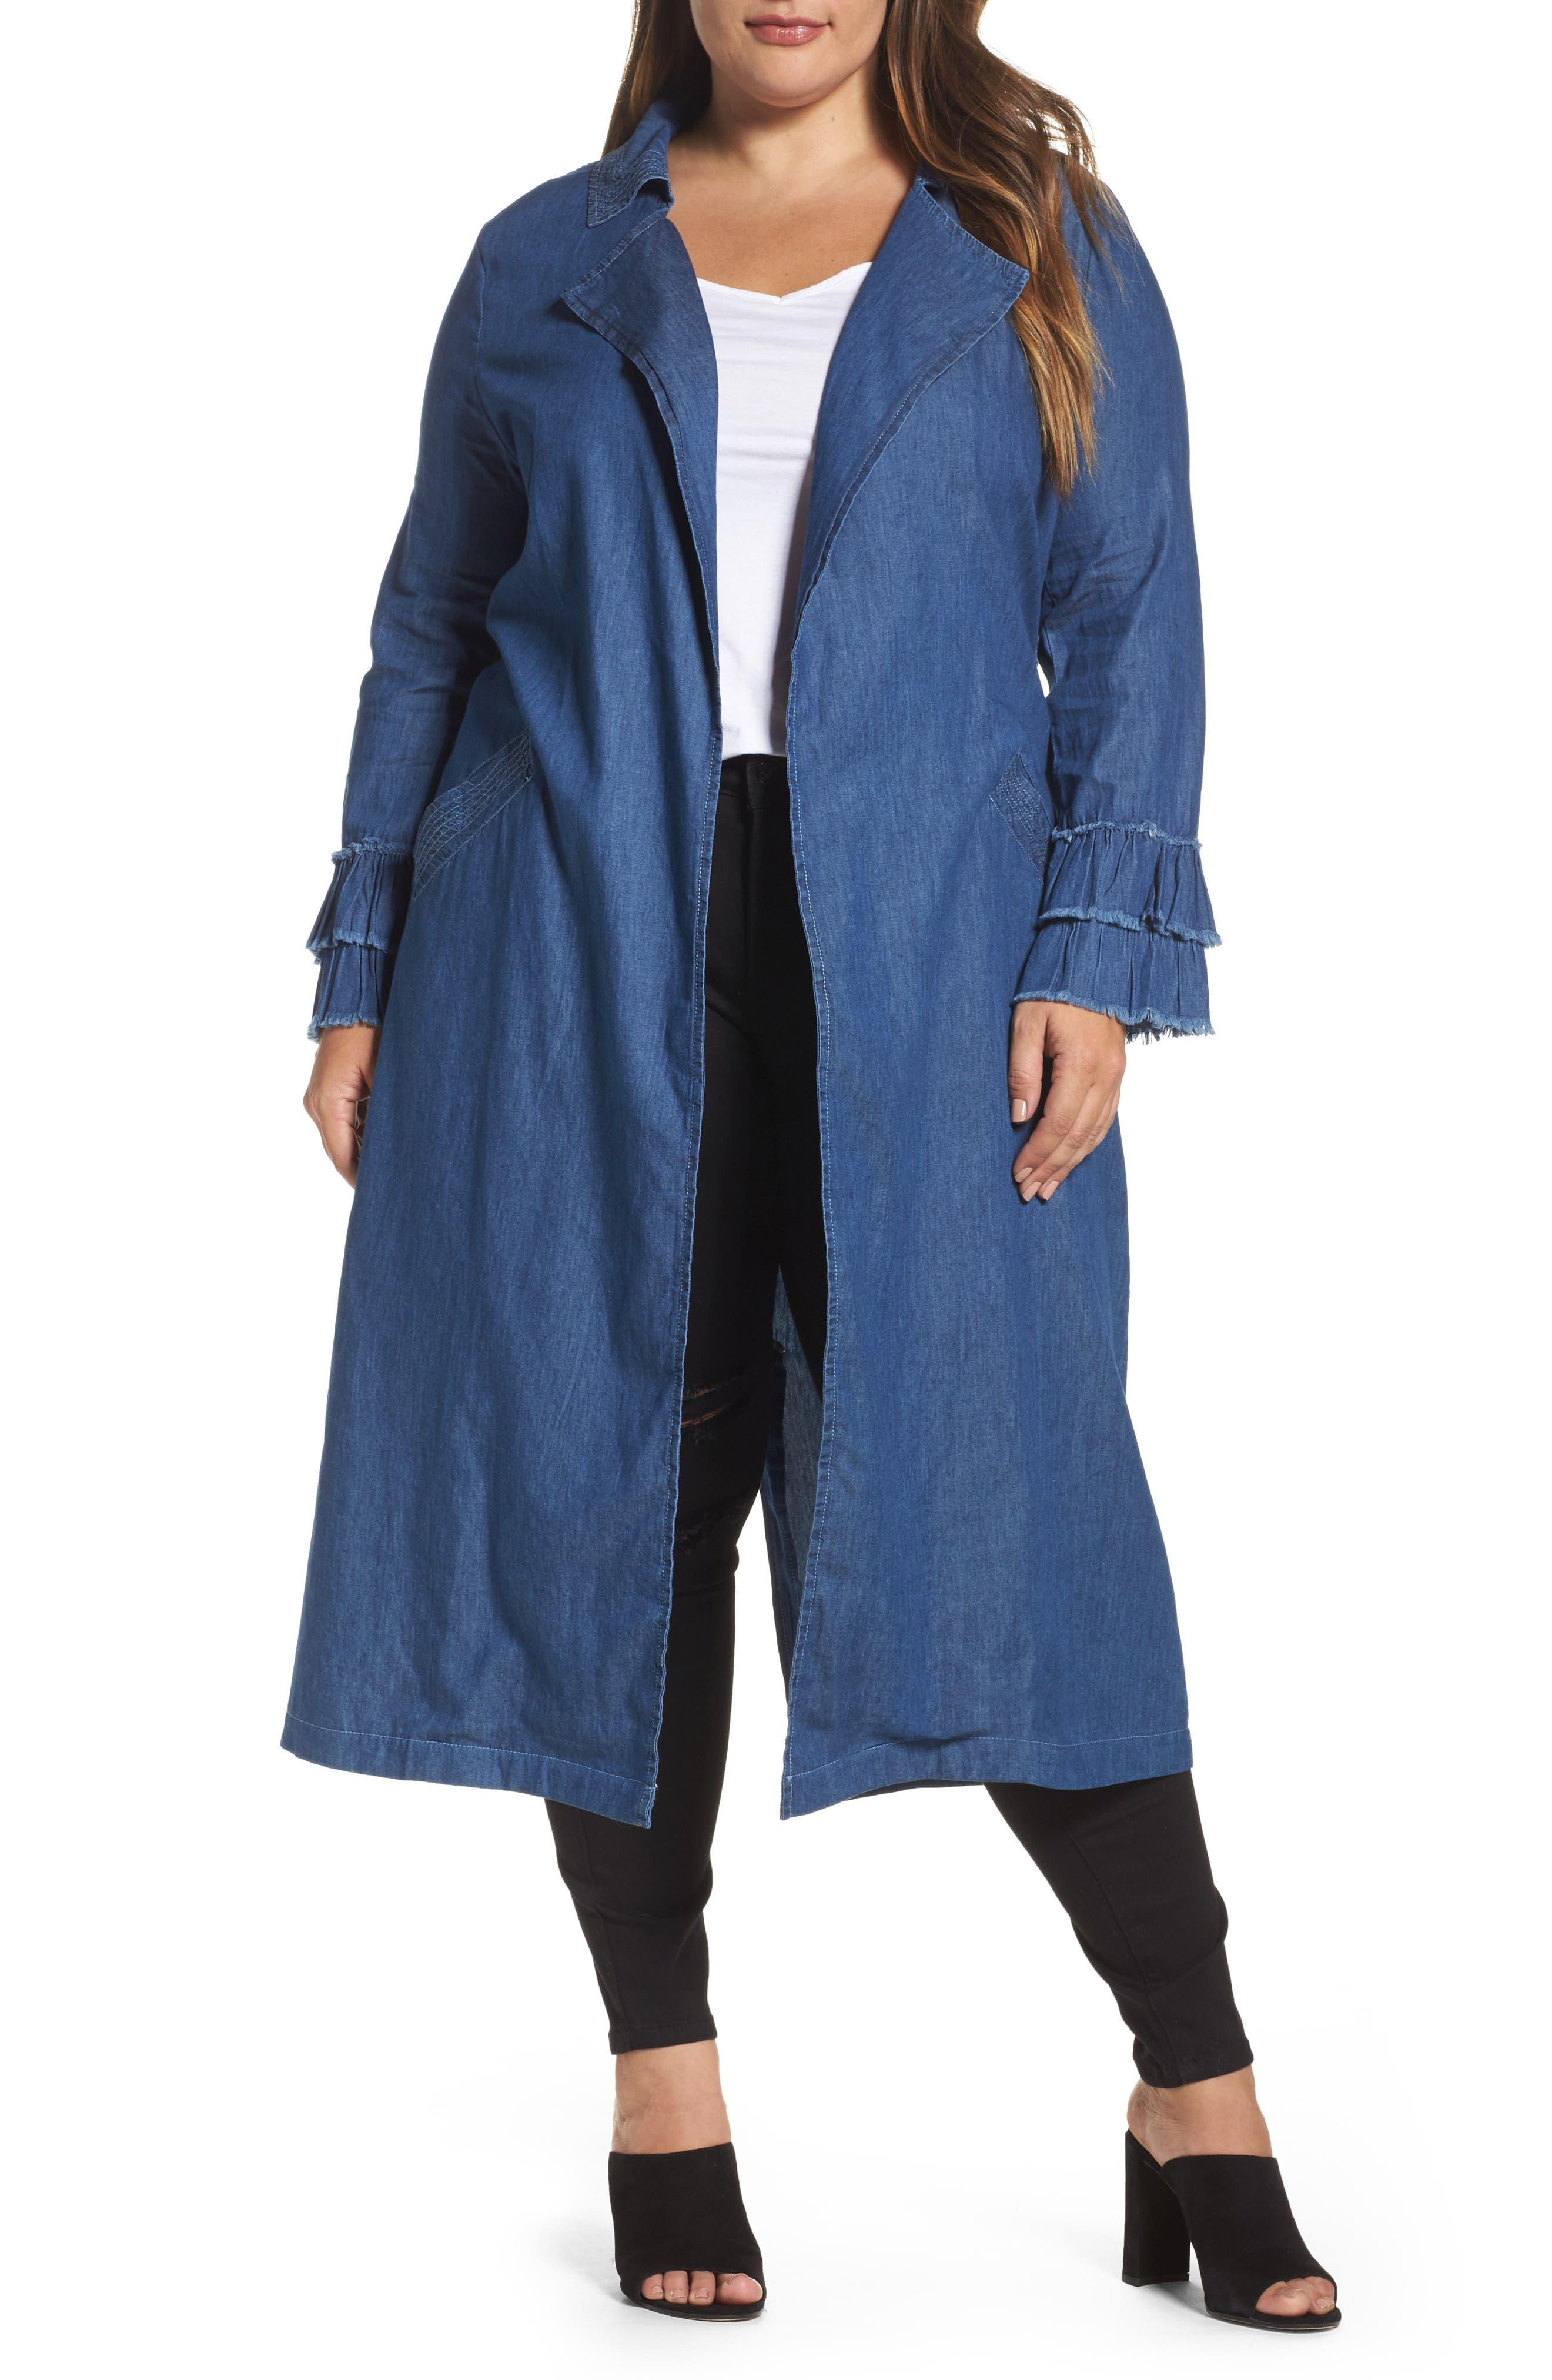 Main Image - ELVI Chambray Trench Coat (Plus Size)